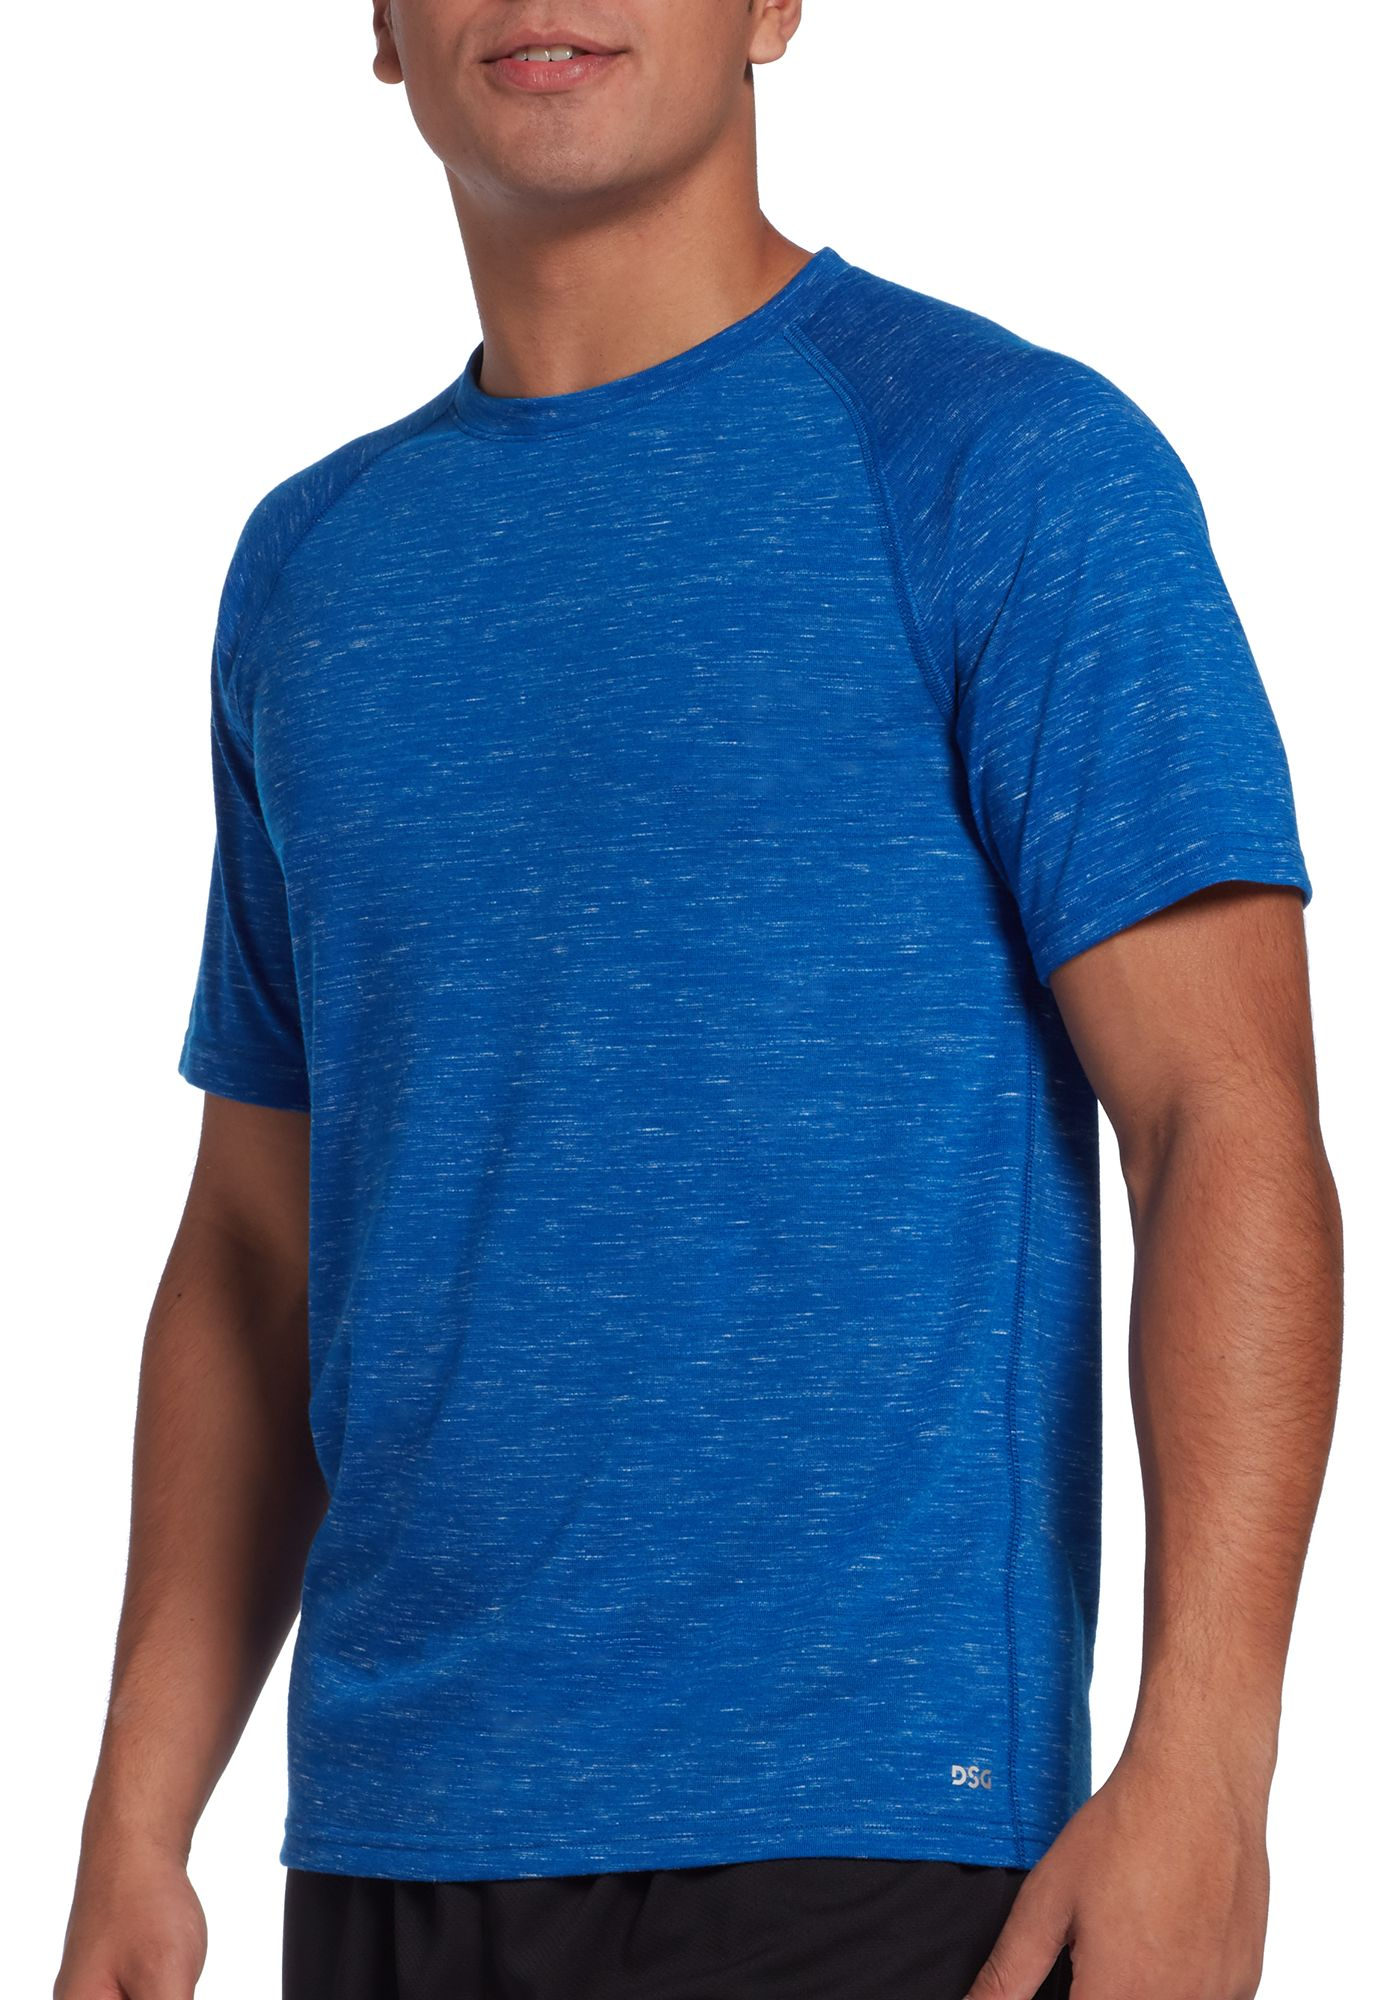 DSG Men's Cotton Training T-Shirt (Regular and Big & Tall)